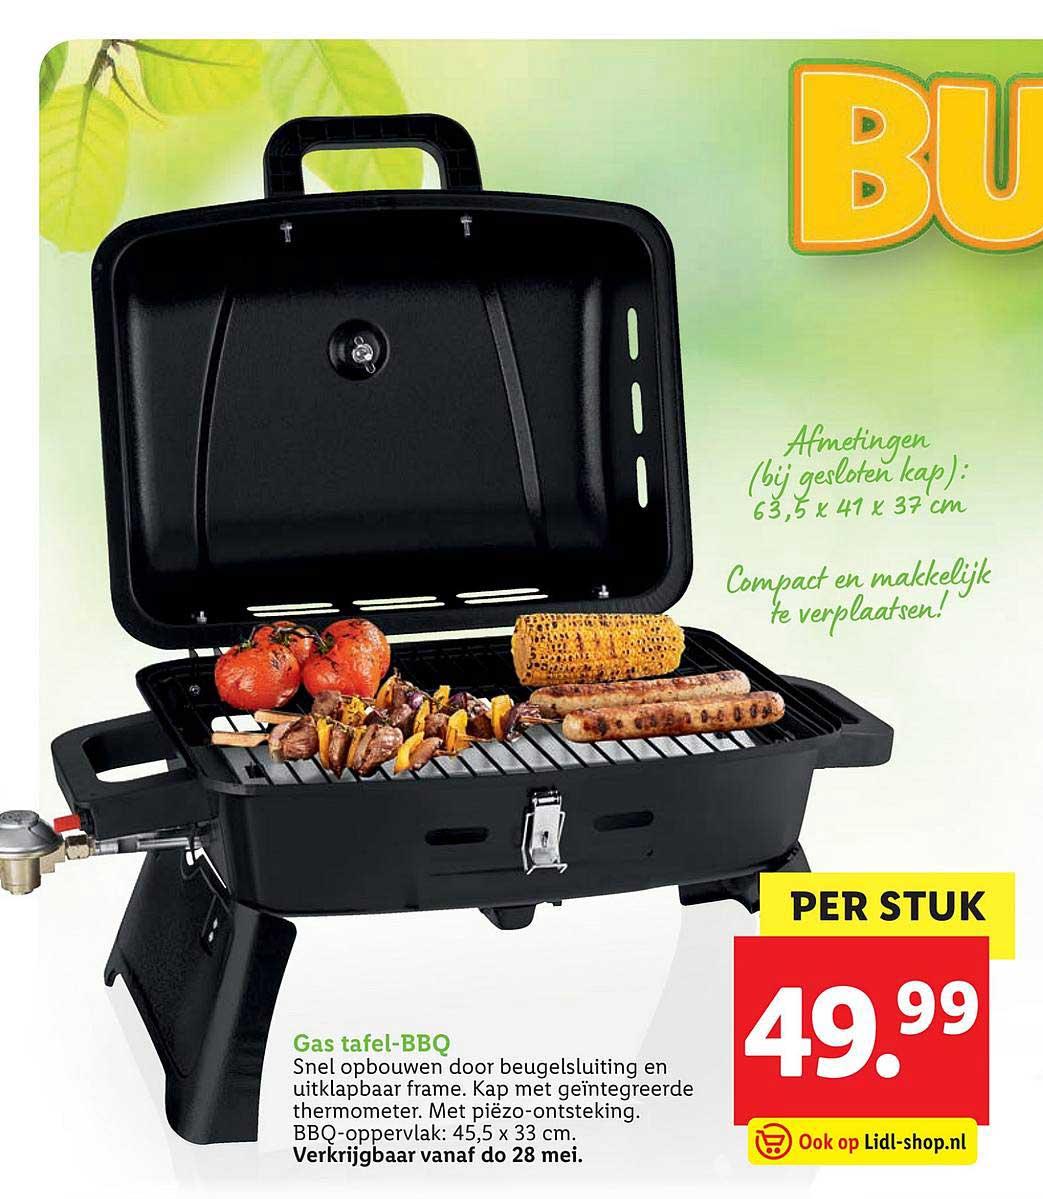 barbecue spies folder aanbieding bij Blokker details